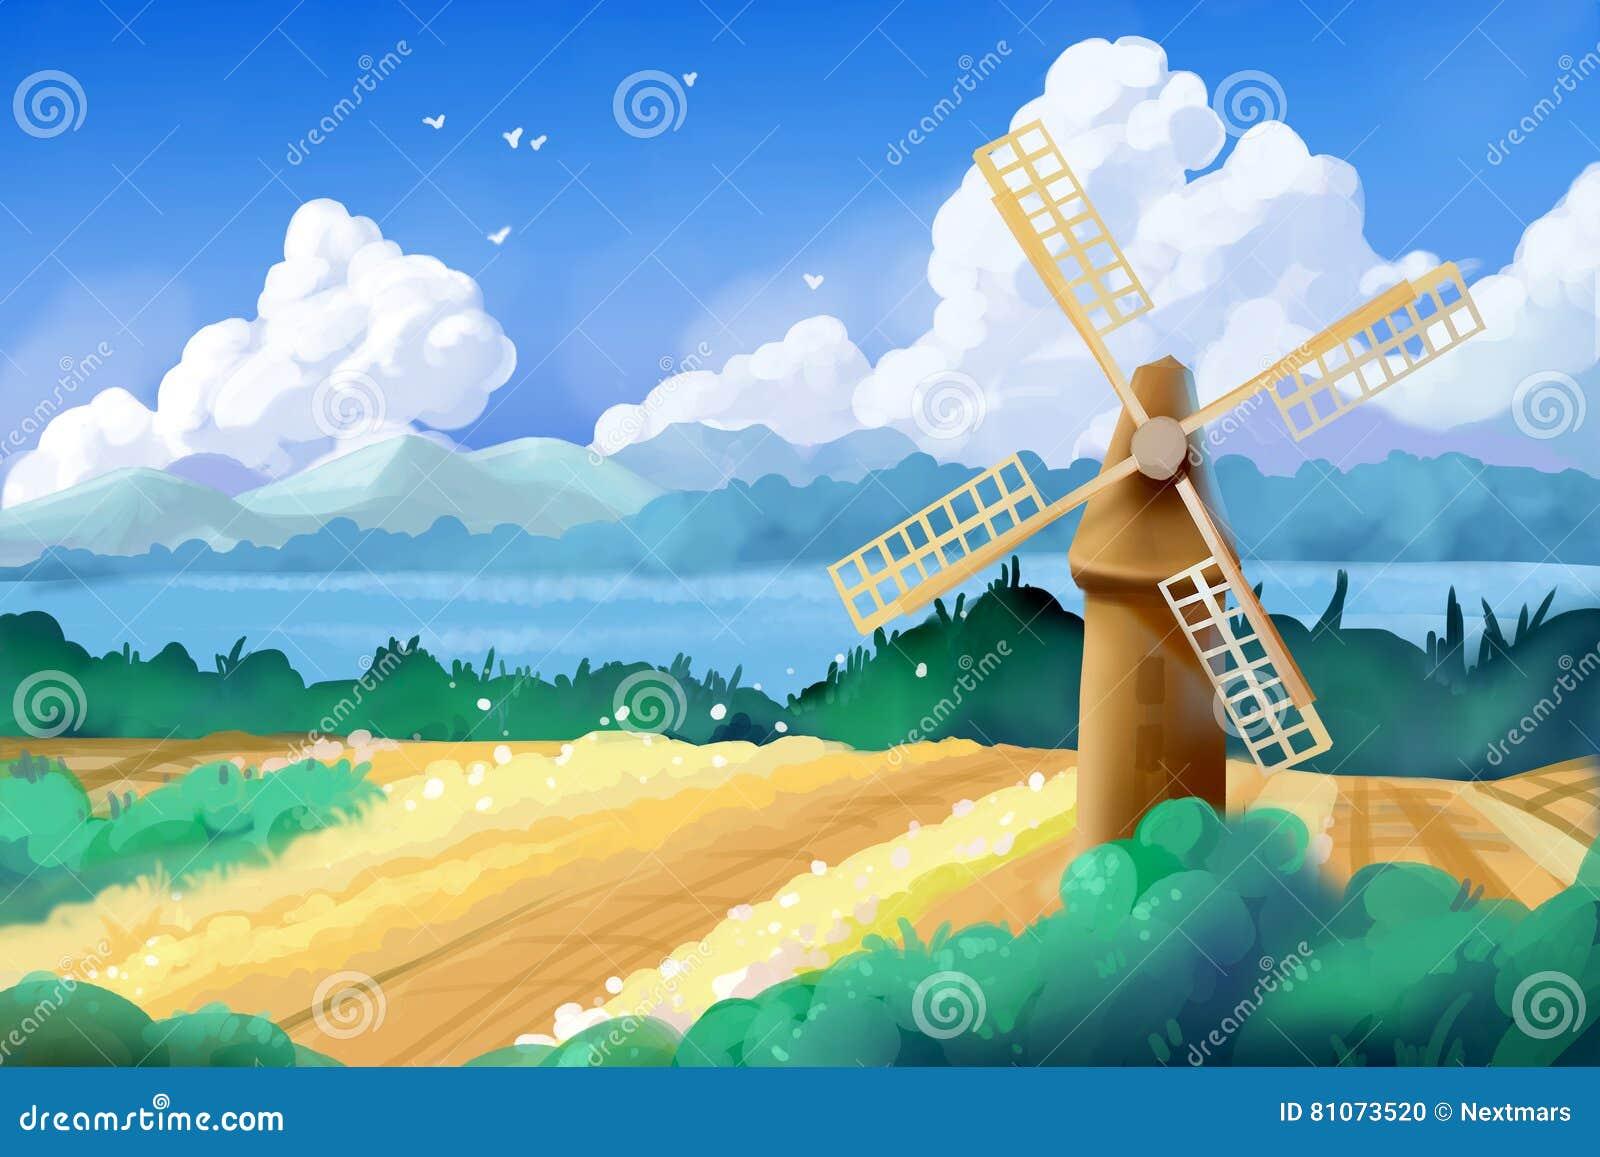 ... : Wheat Fields And Windmill Stock Illustration - Image: 81073520